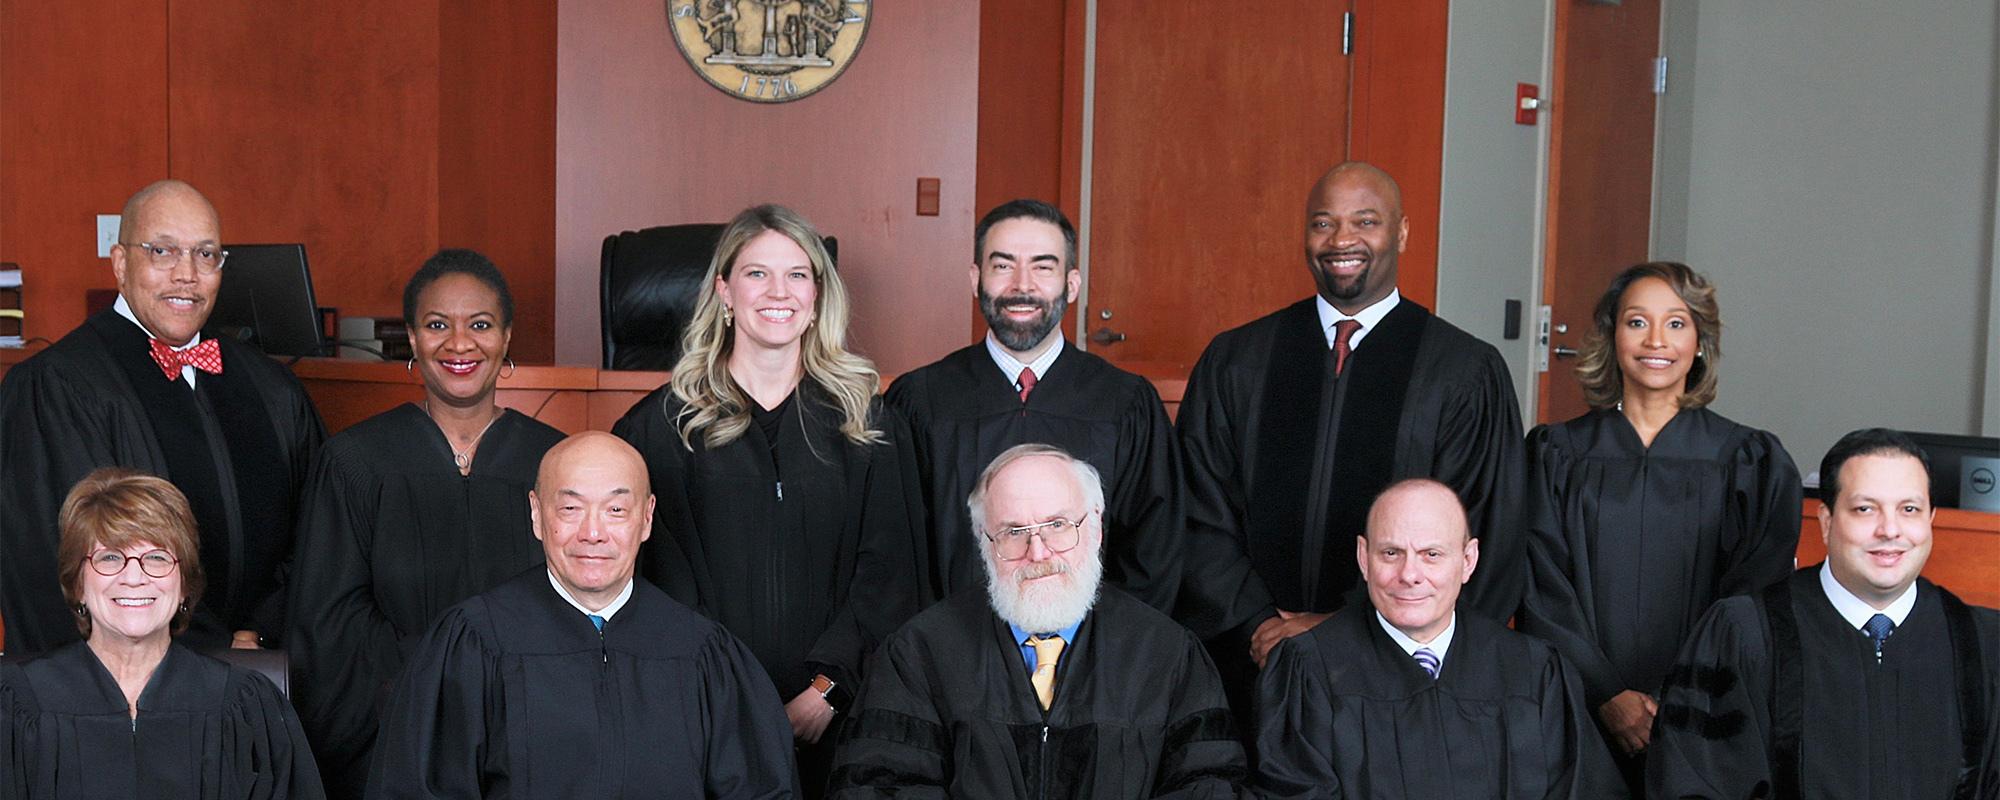 Publish Judges Photo 2020-new